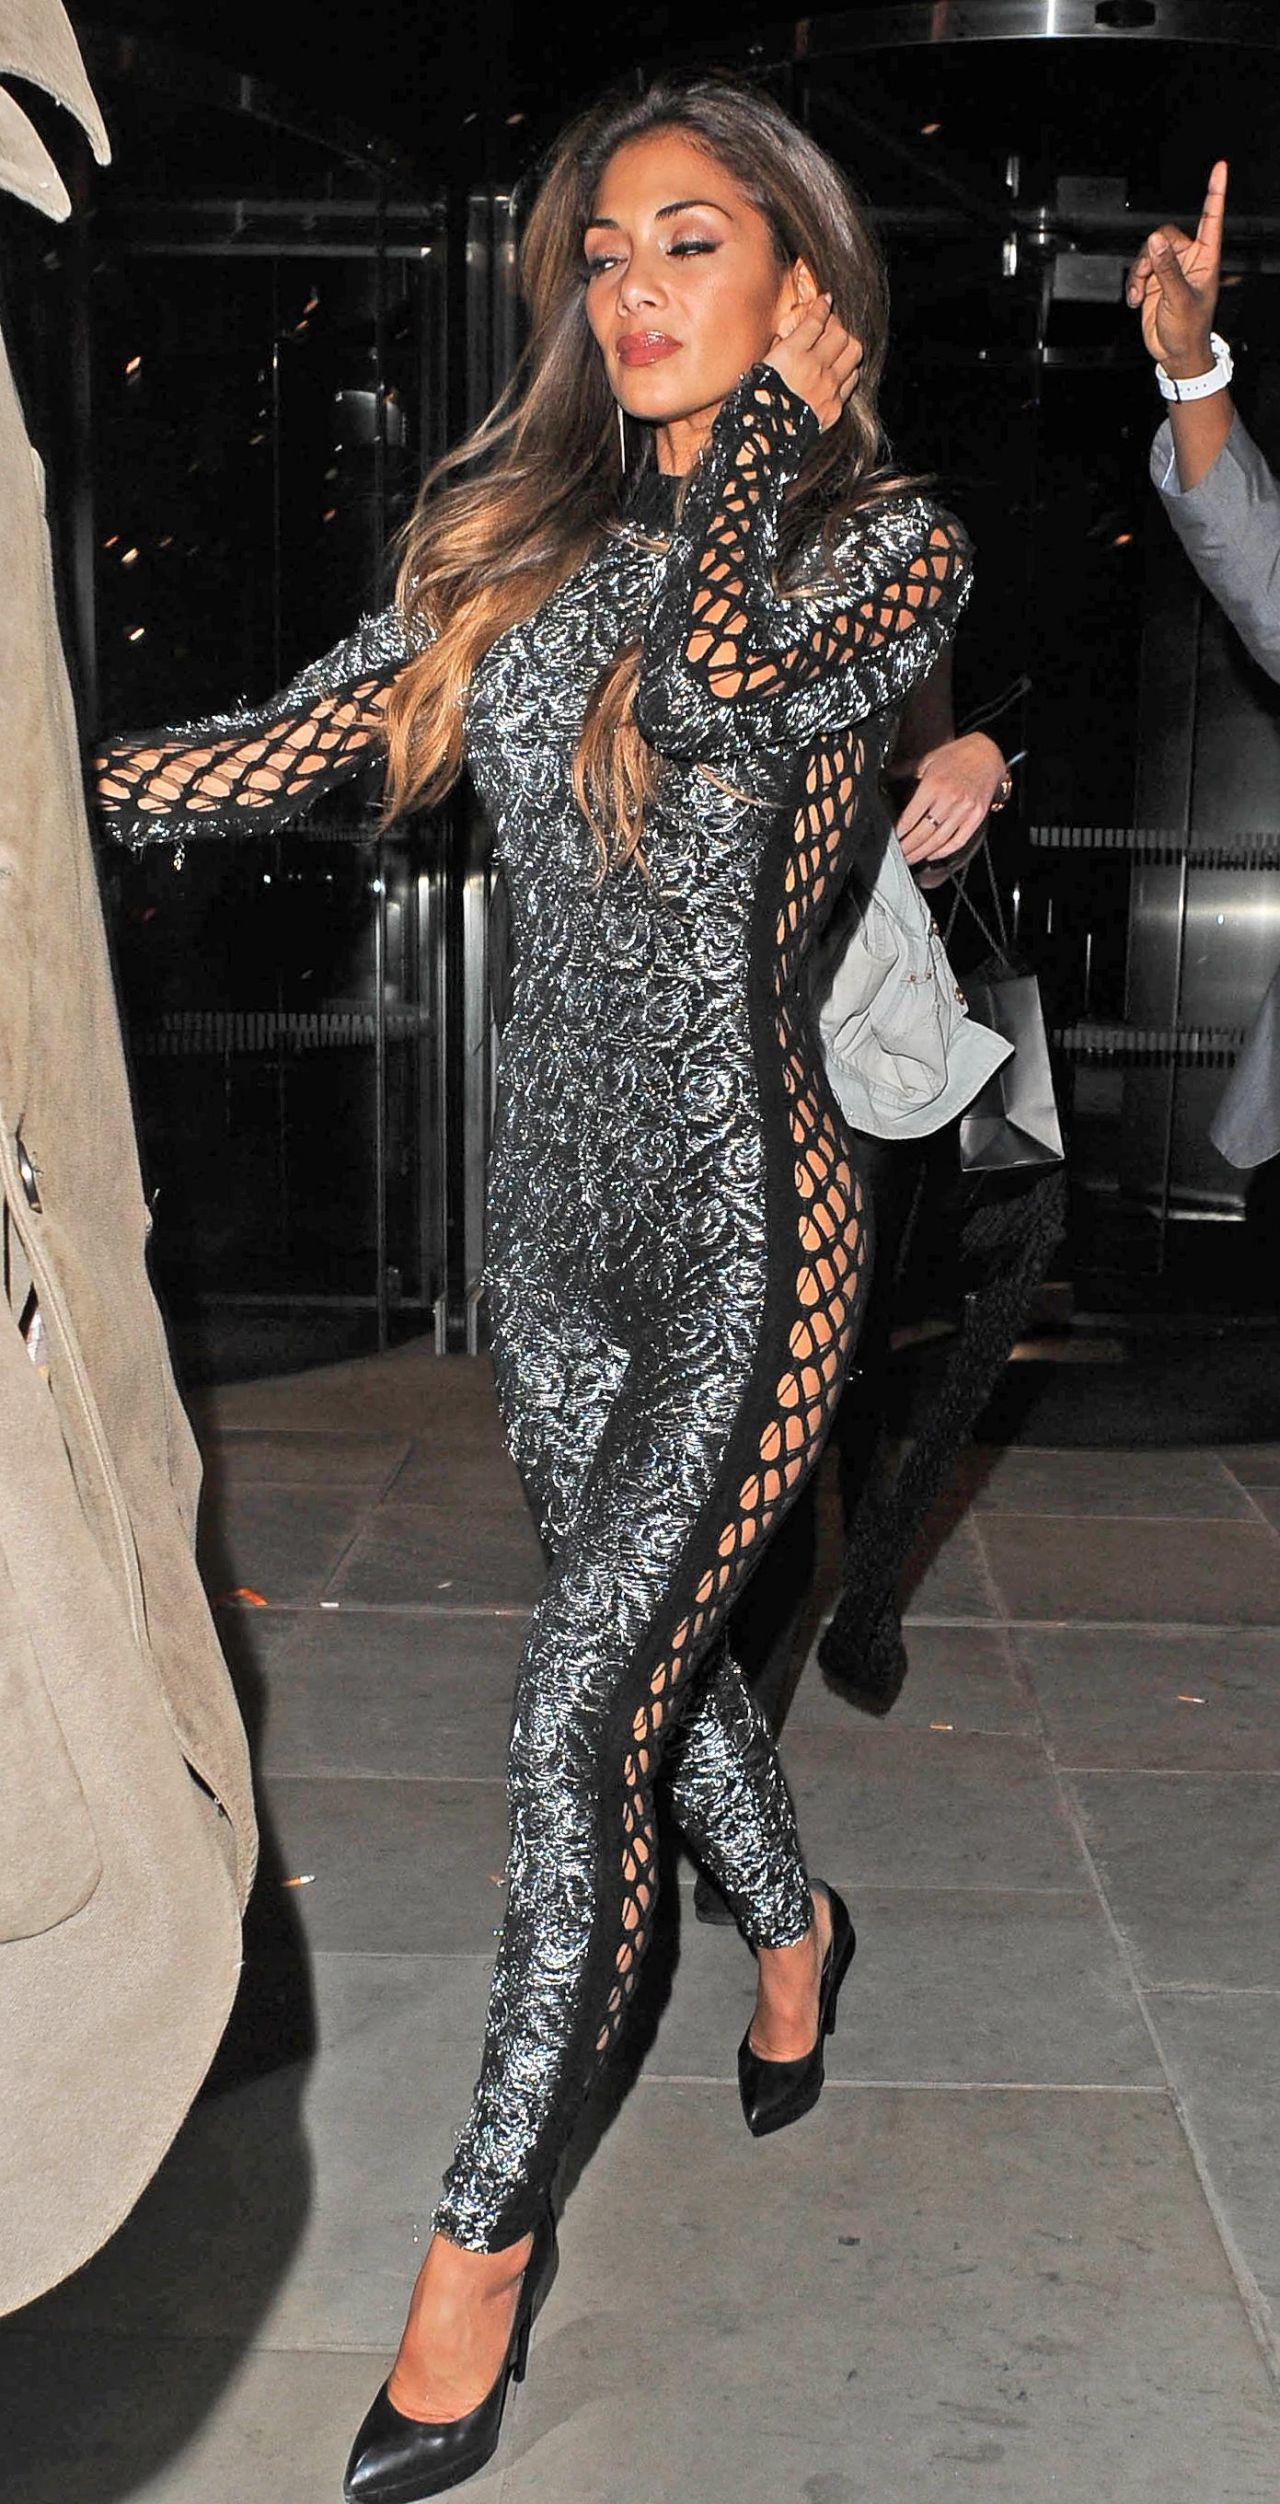 Nicole Scherzinger Shows Off Hot Body - Attending Sushi -6263